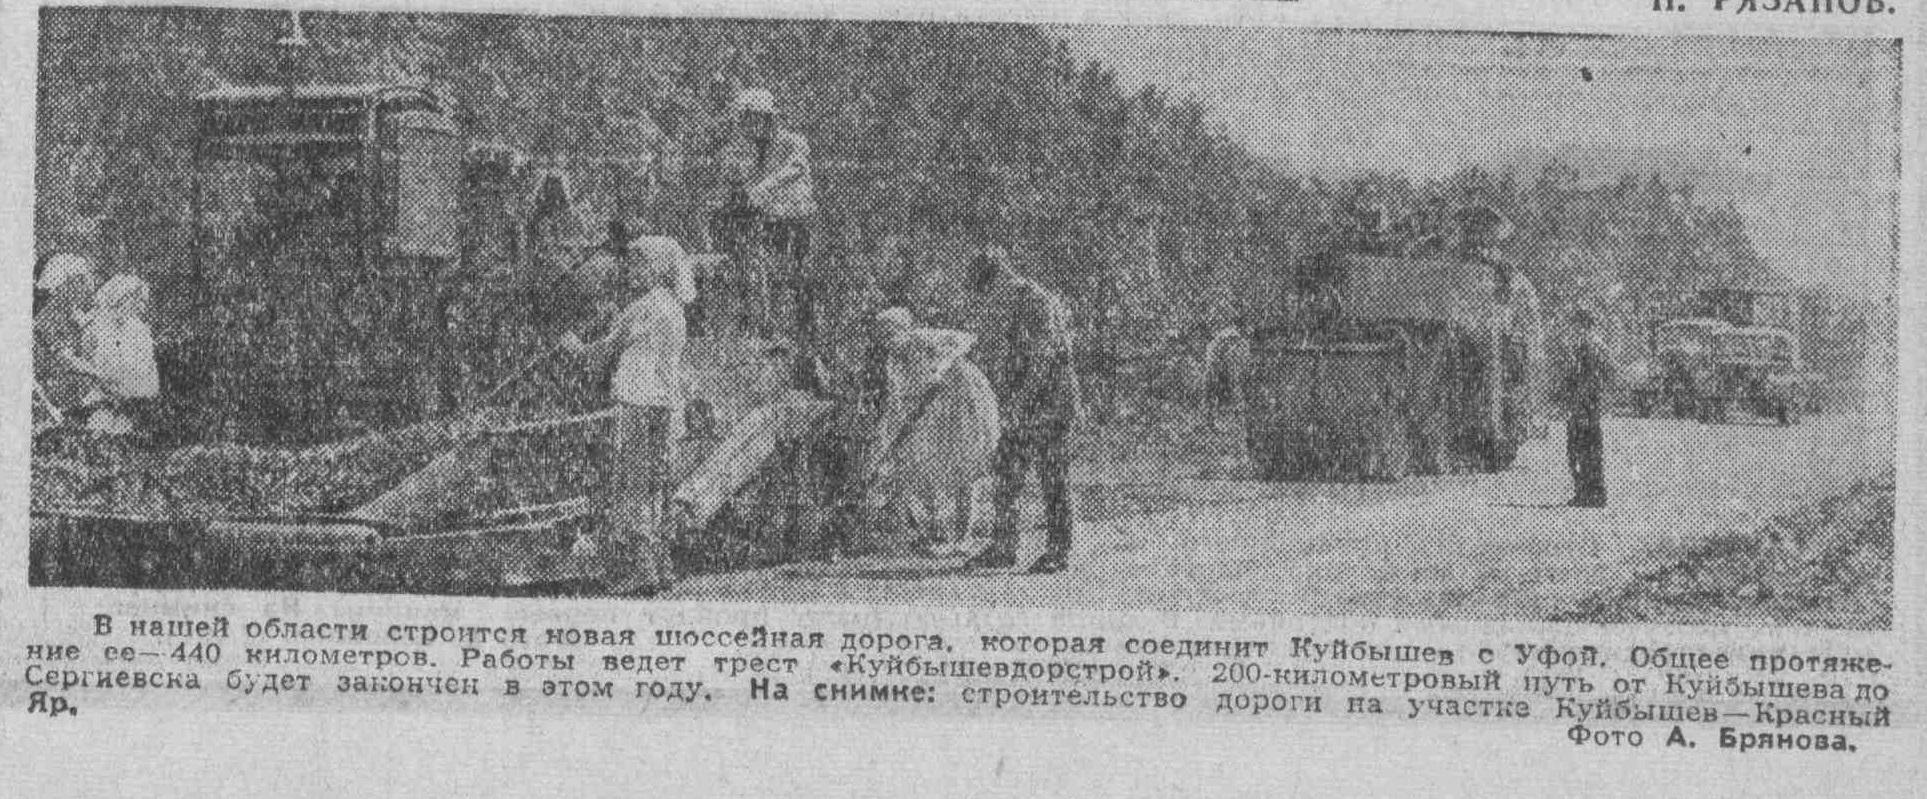 Московское-ФОТО-57-ВКа-1964-07-12-фото со стр-ва дороги Куйб.-Уфа